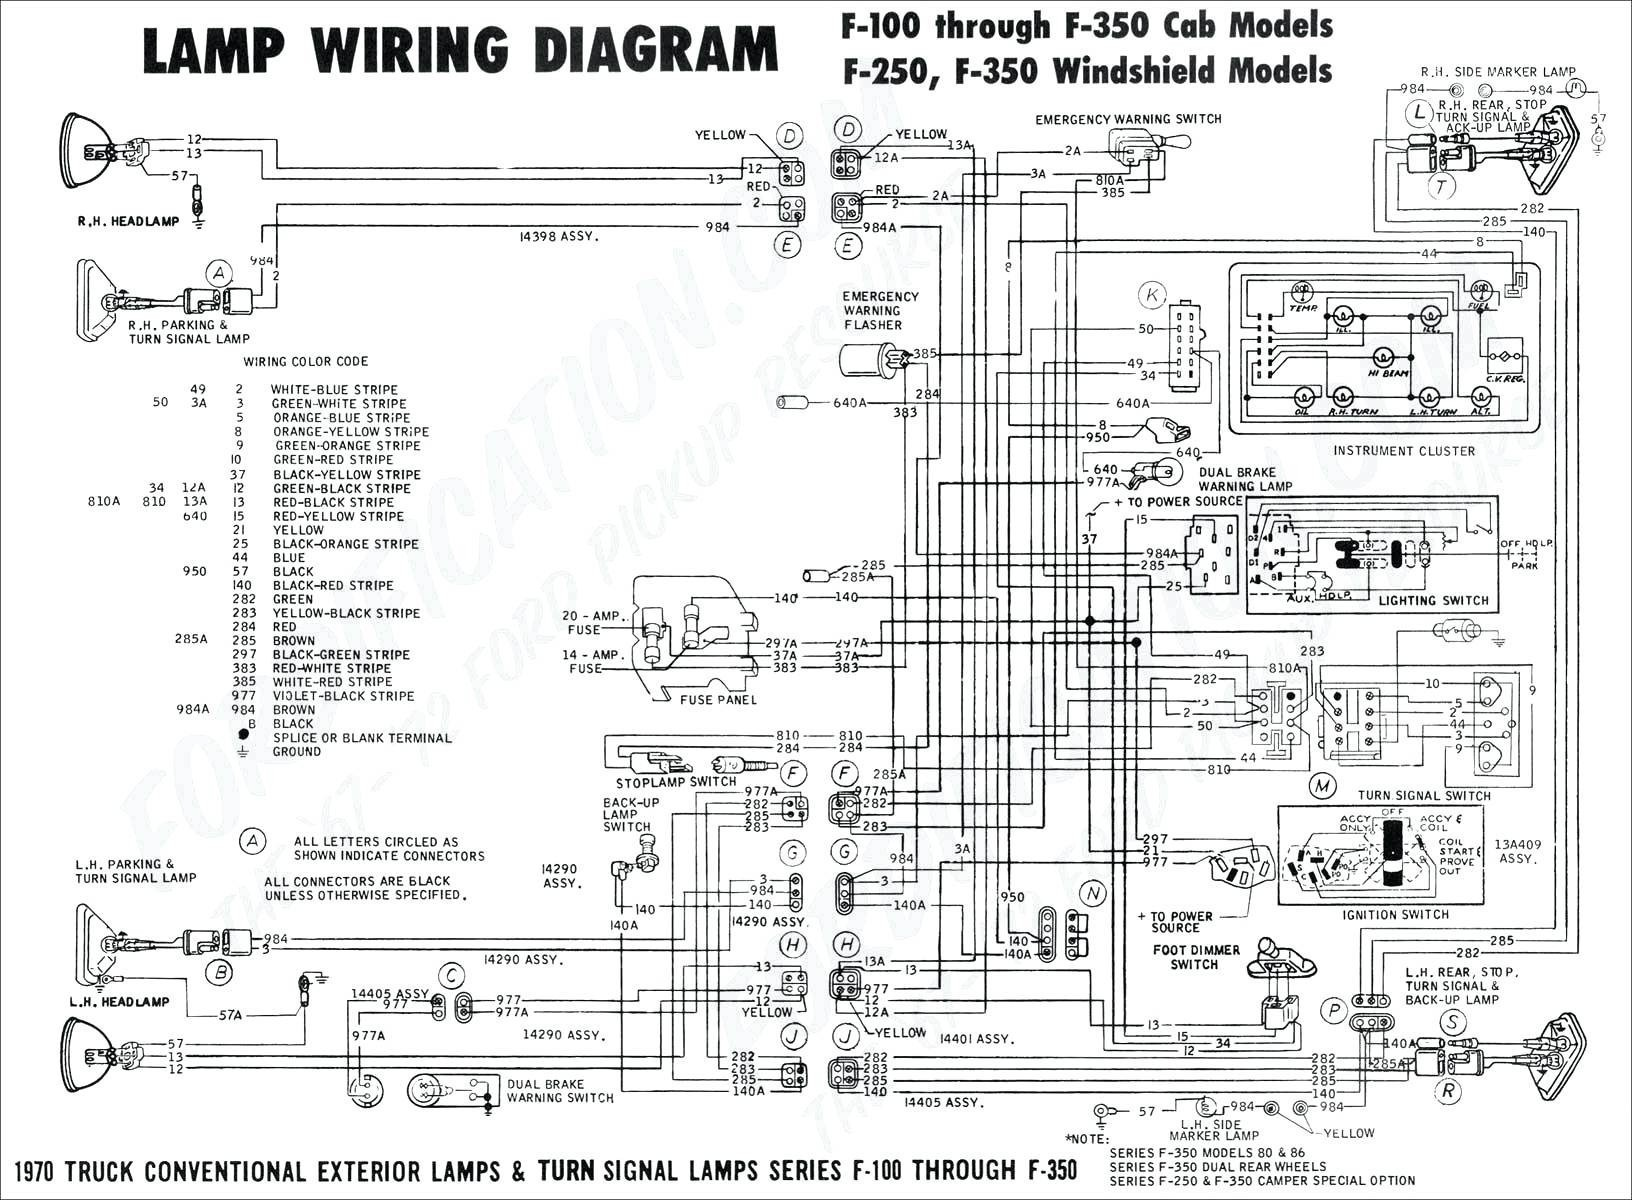 Emergency Ballast Wiring Diagram Bill Nash Wiring Diagram Wiring Diagram Experts Of Emergency Ballast Wiring Diagram